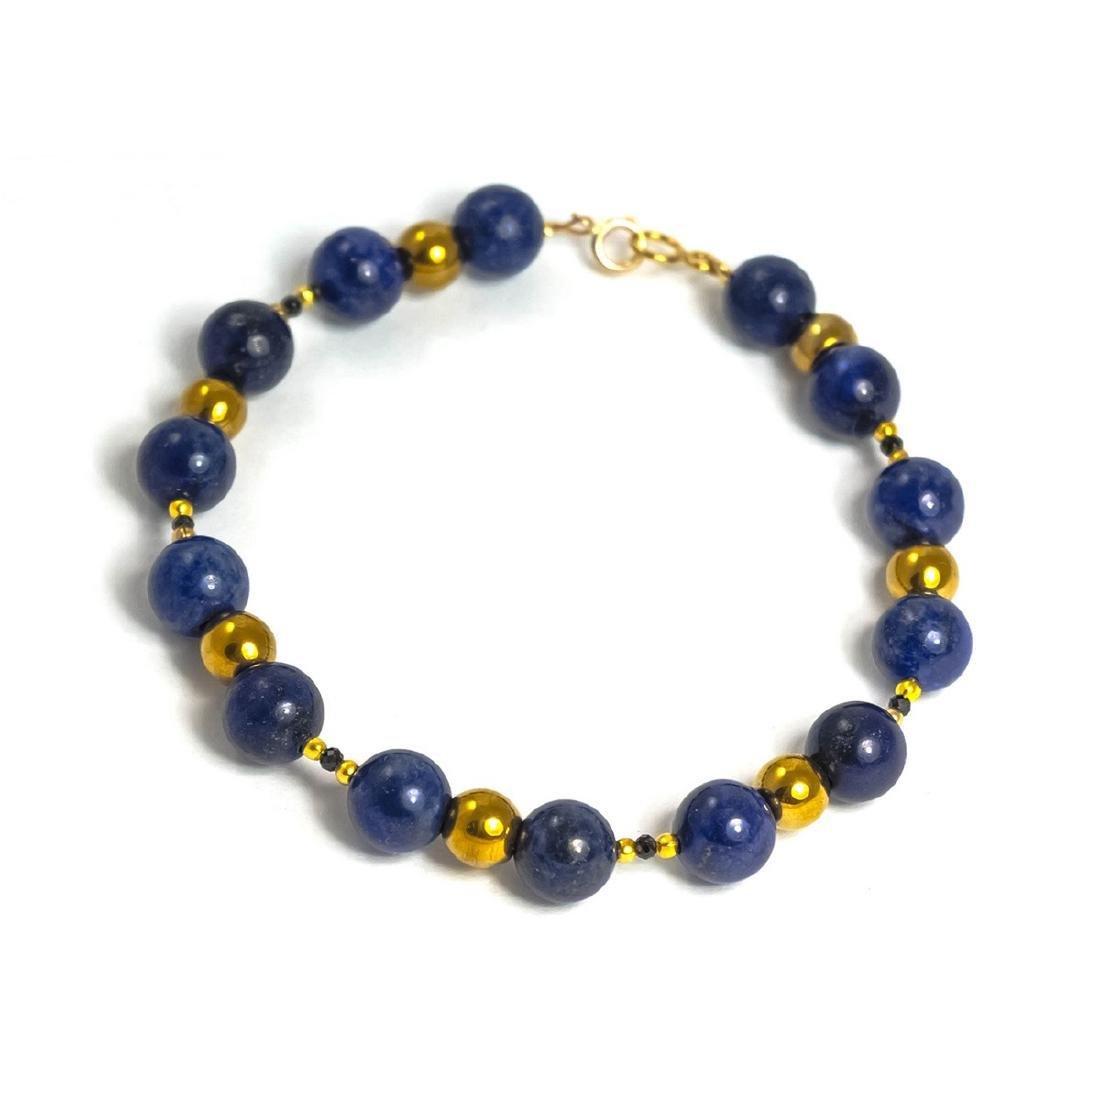 Vintage Style 14K Gold Lapis Lazuli Sapphire Bracelet - 2